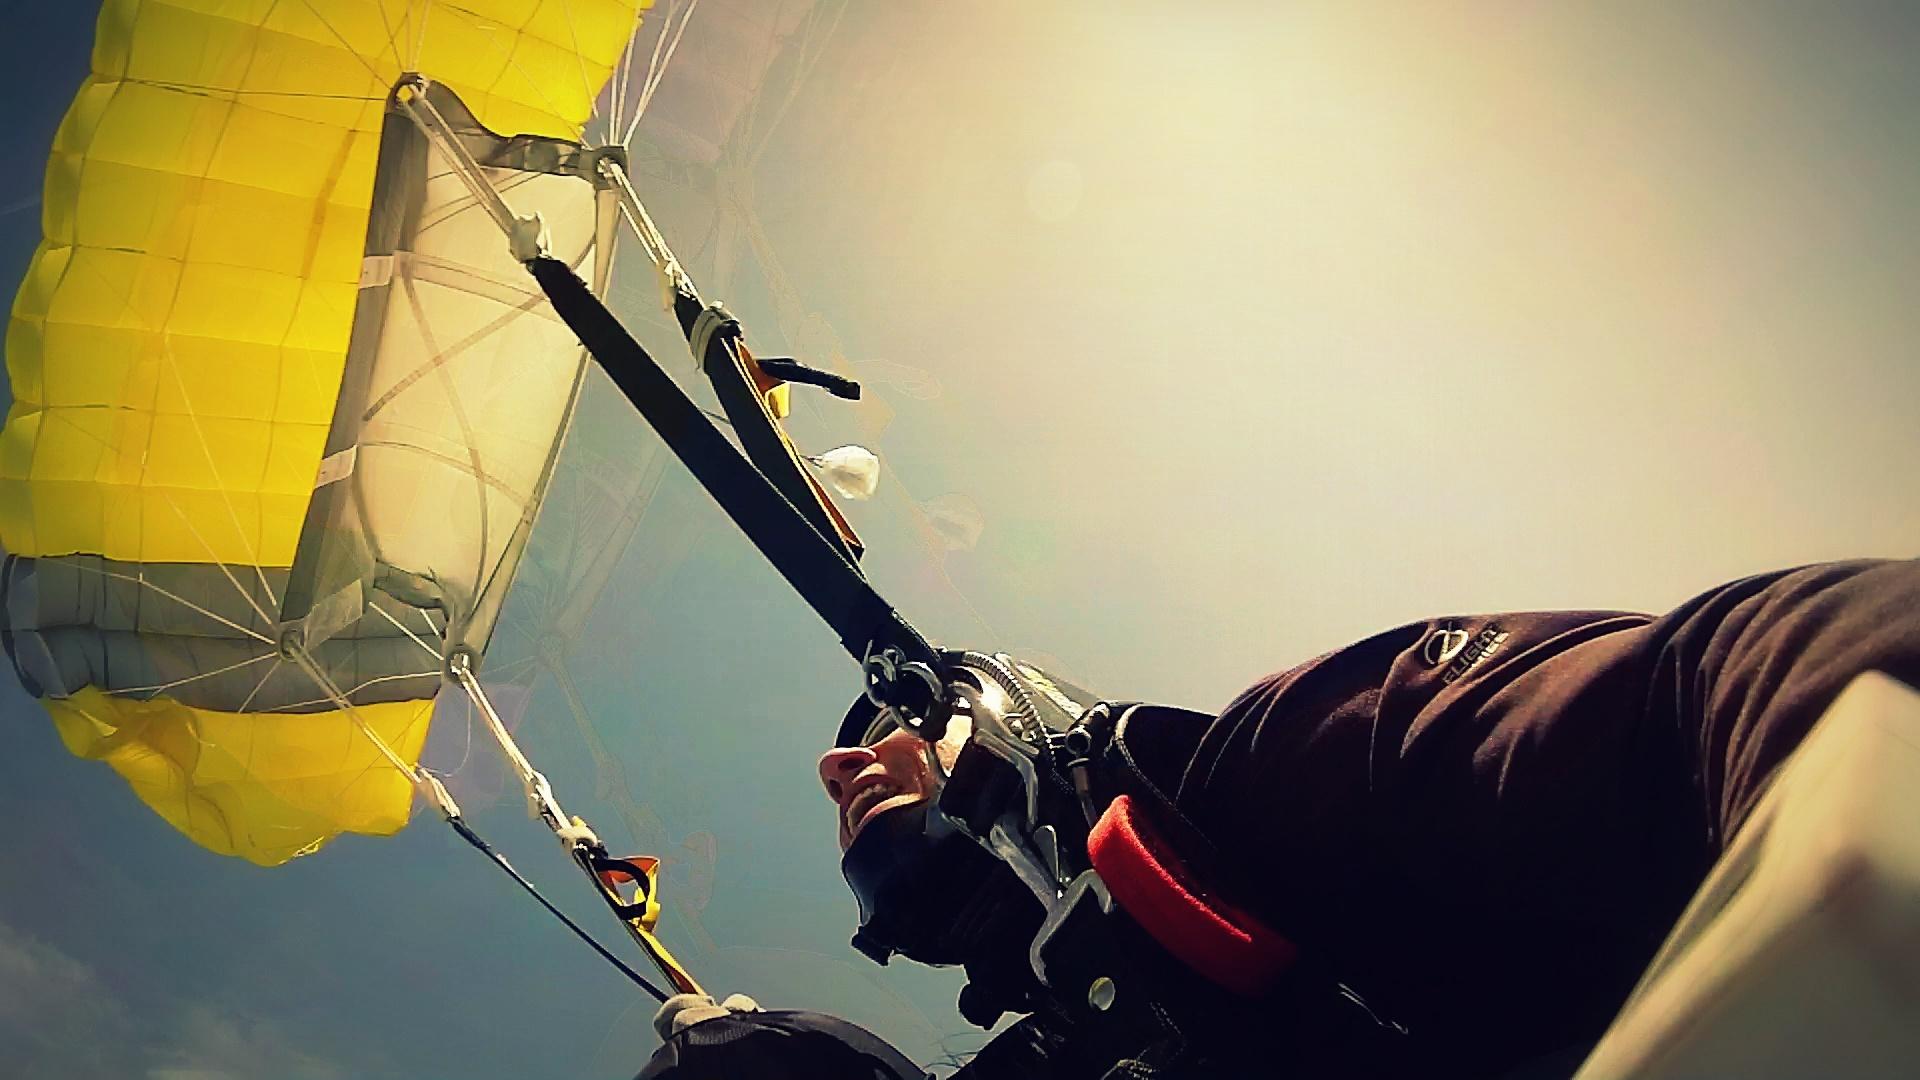 tandemmichl www.mein-skydive.de, tandem skydive, tandem skydiving, tandemskydive, tandemskydiving, tandem jump, tandem jumping, tandemjump, tandemjumping